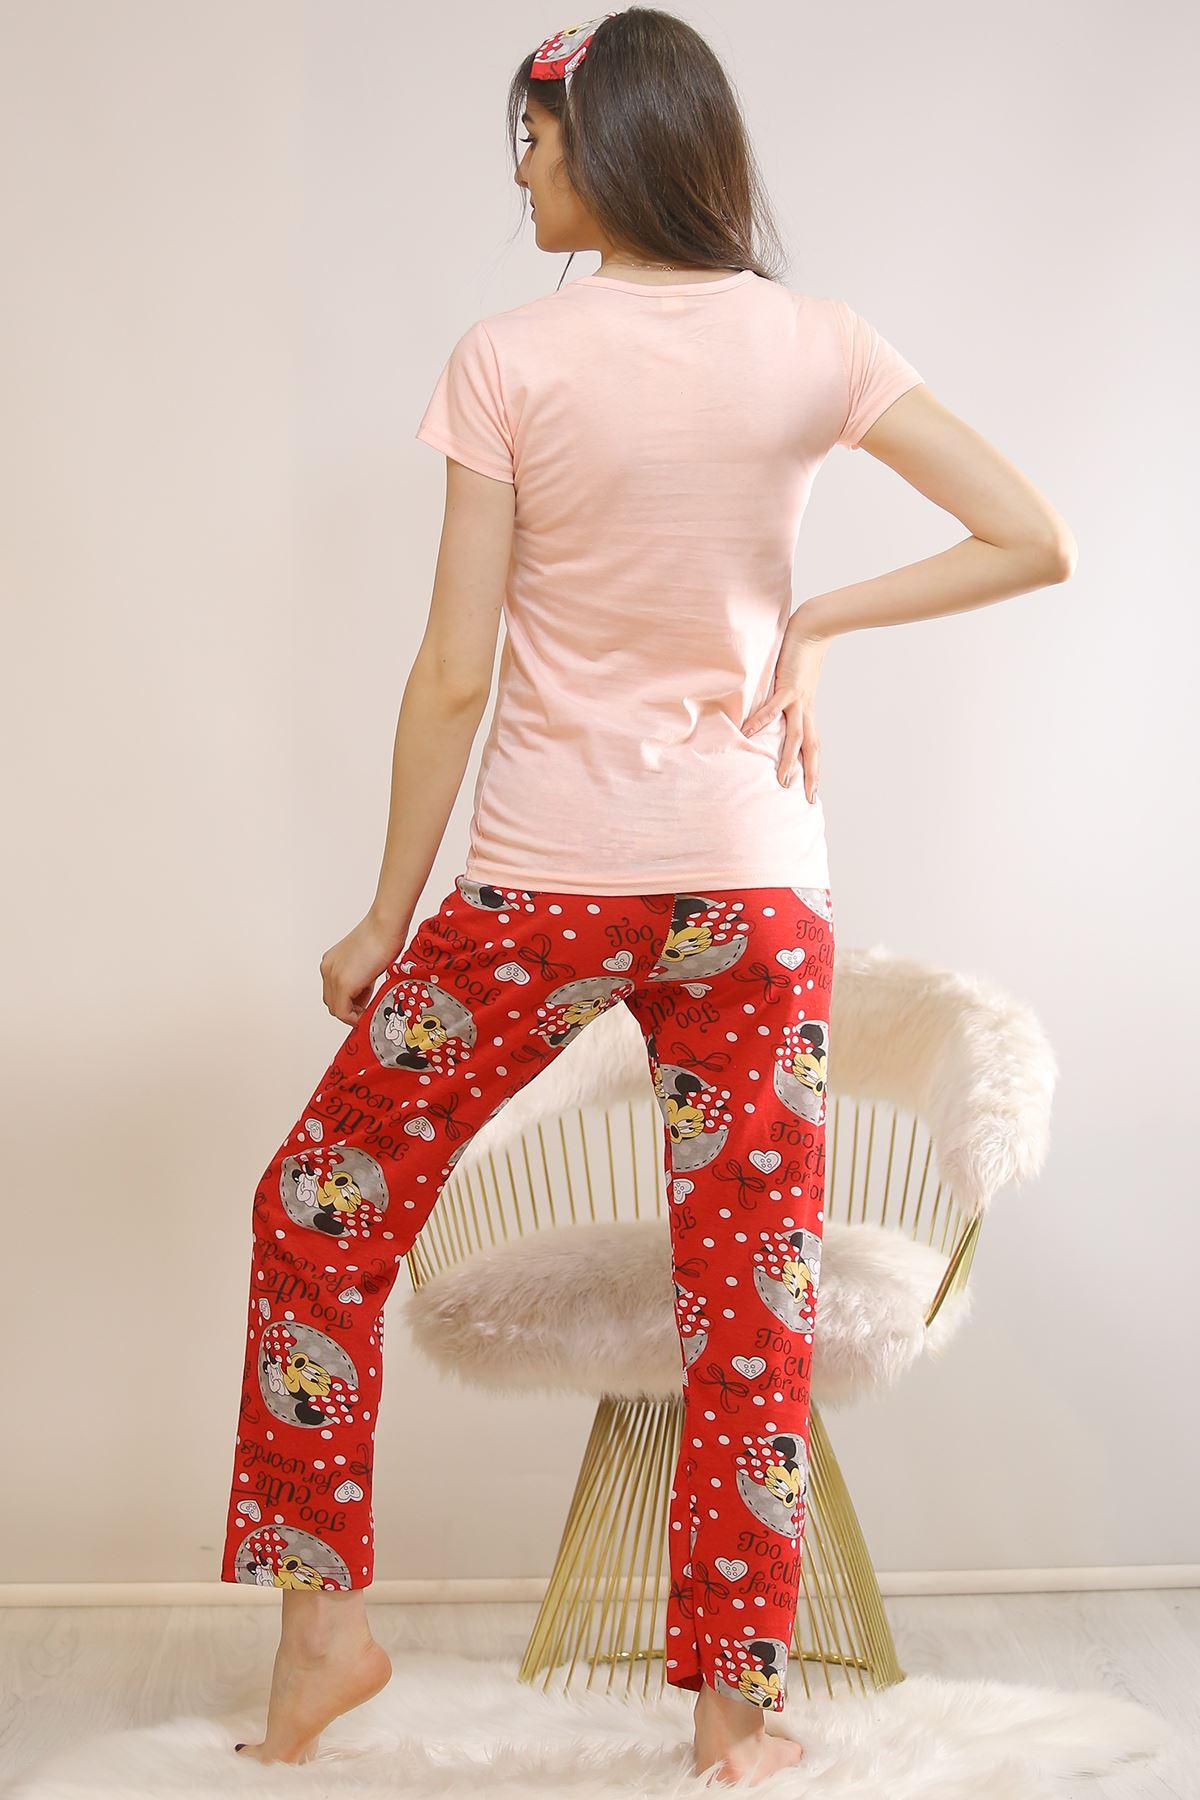 Baskılı Pijama Takımı Pudra - 5813.102.